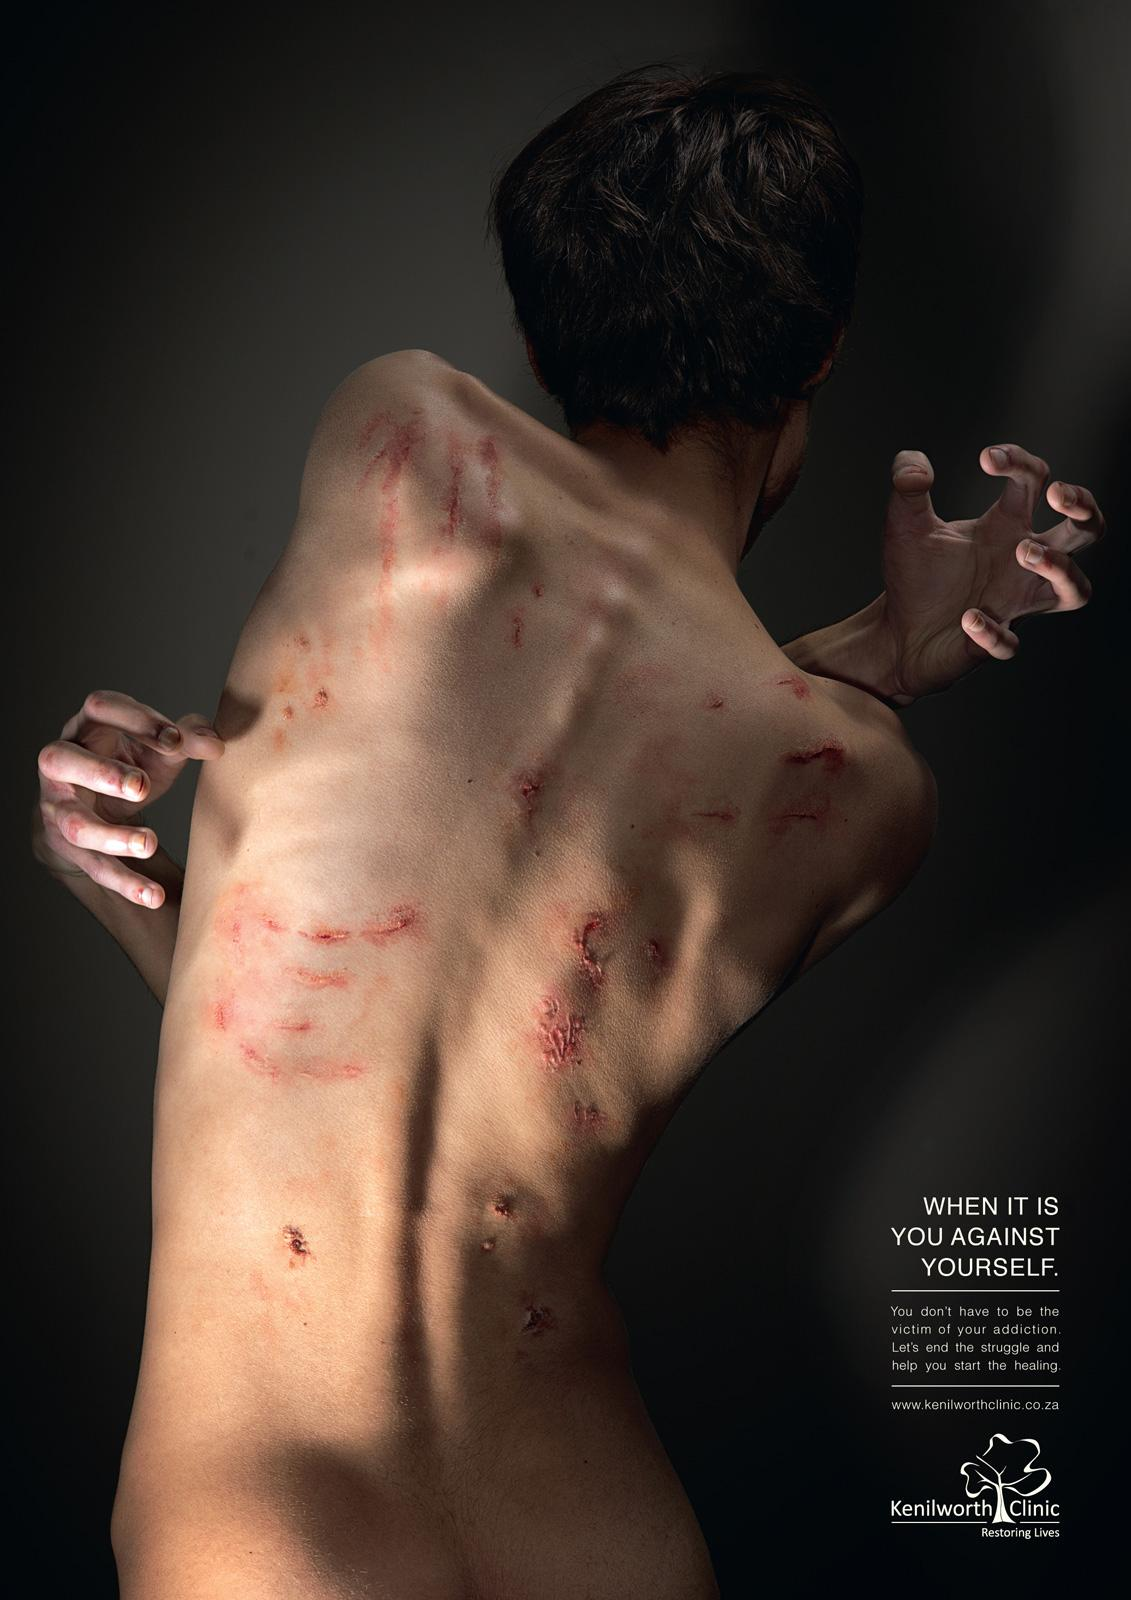 Kenilworth Clinic Print Ad -  Inner Struggle, Man